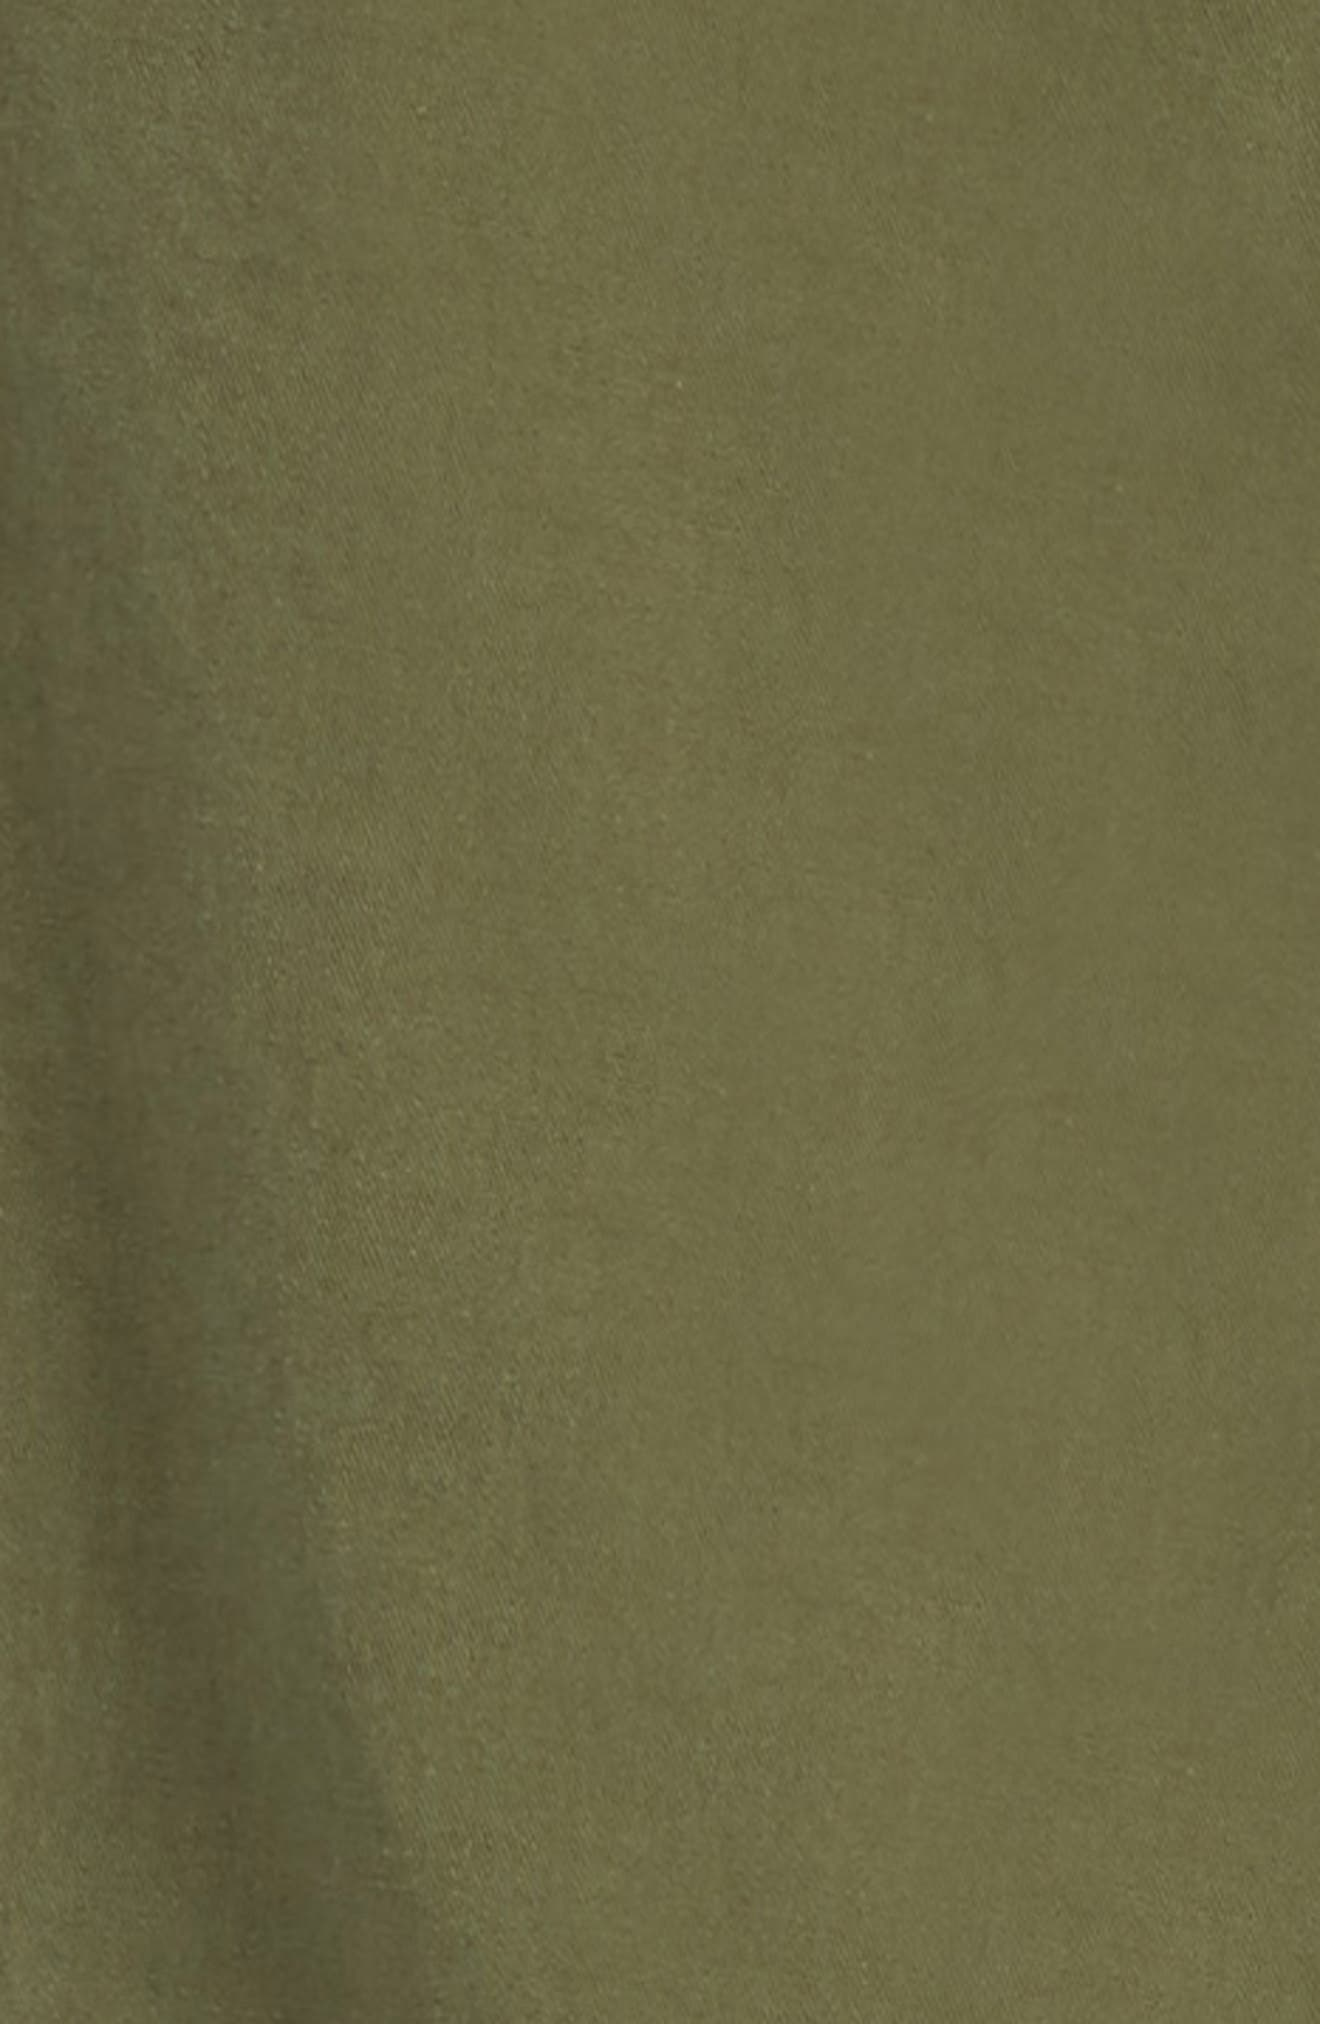 Flynn Moto Chinos,                             Alternate thumbnail 2, color,                             250